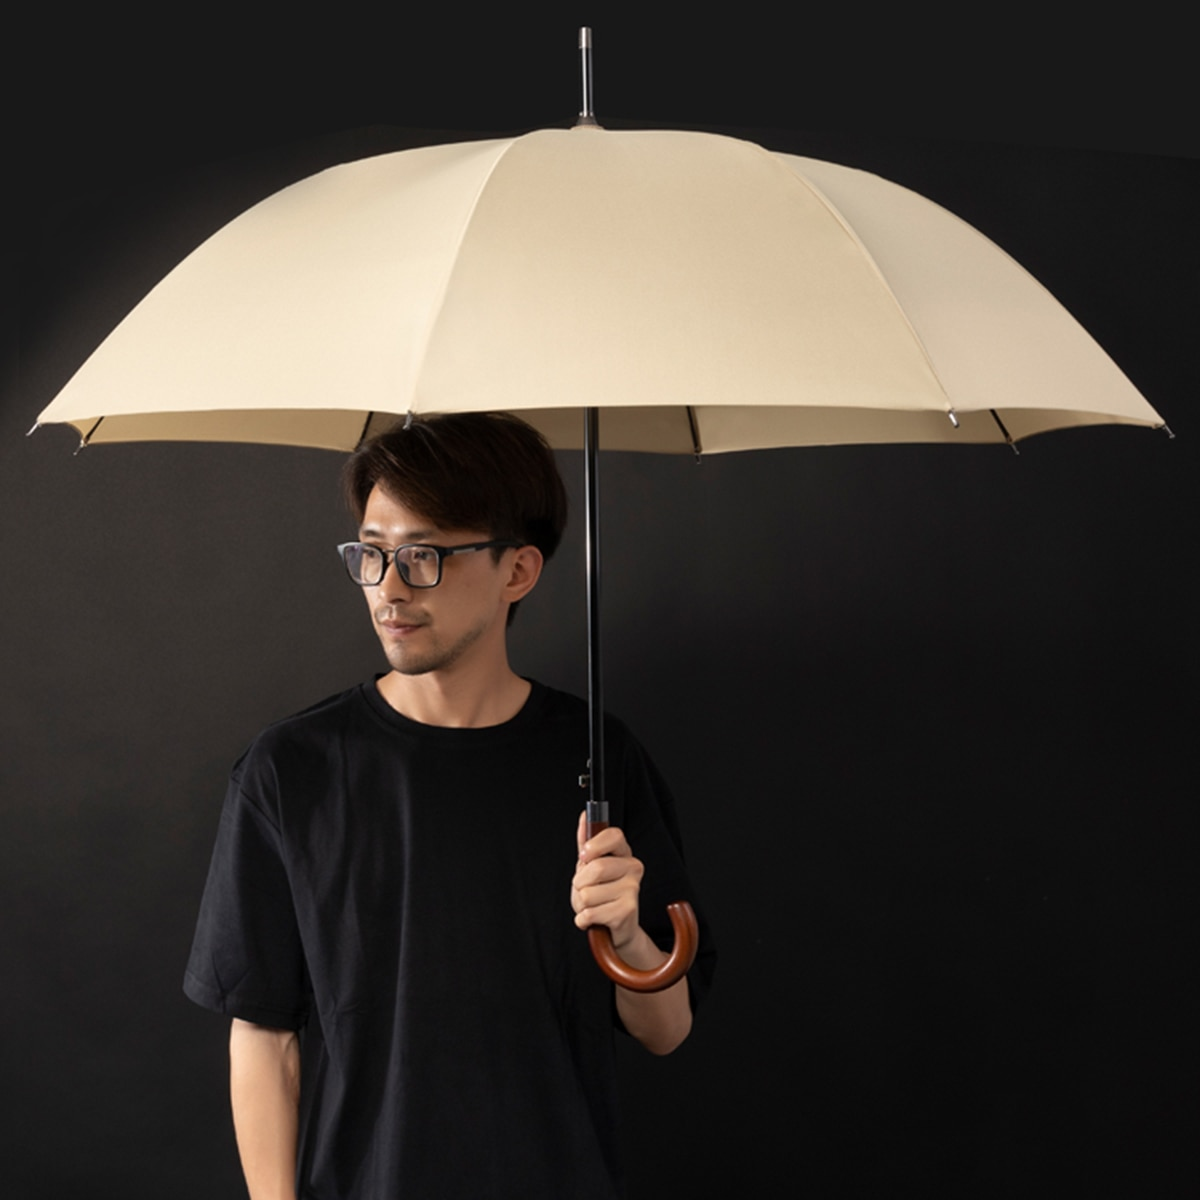 New Arrival Japanese Brand Long Umbrella 8K Windproof Wooden Handle Large Men Umbrellas Rain Quality Classic Business Paraguas enlarge